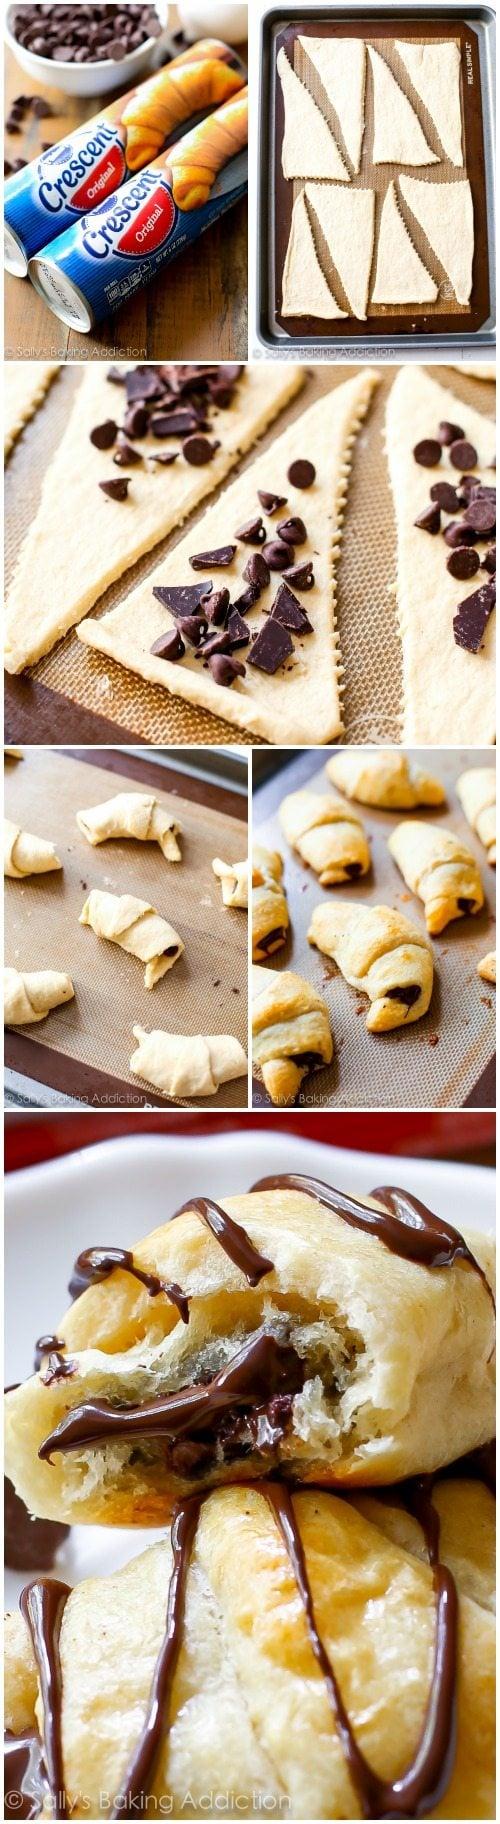 20 Minute Chocolate Crescents (Croissants). - Sallys Baking Addiction